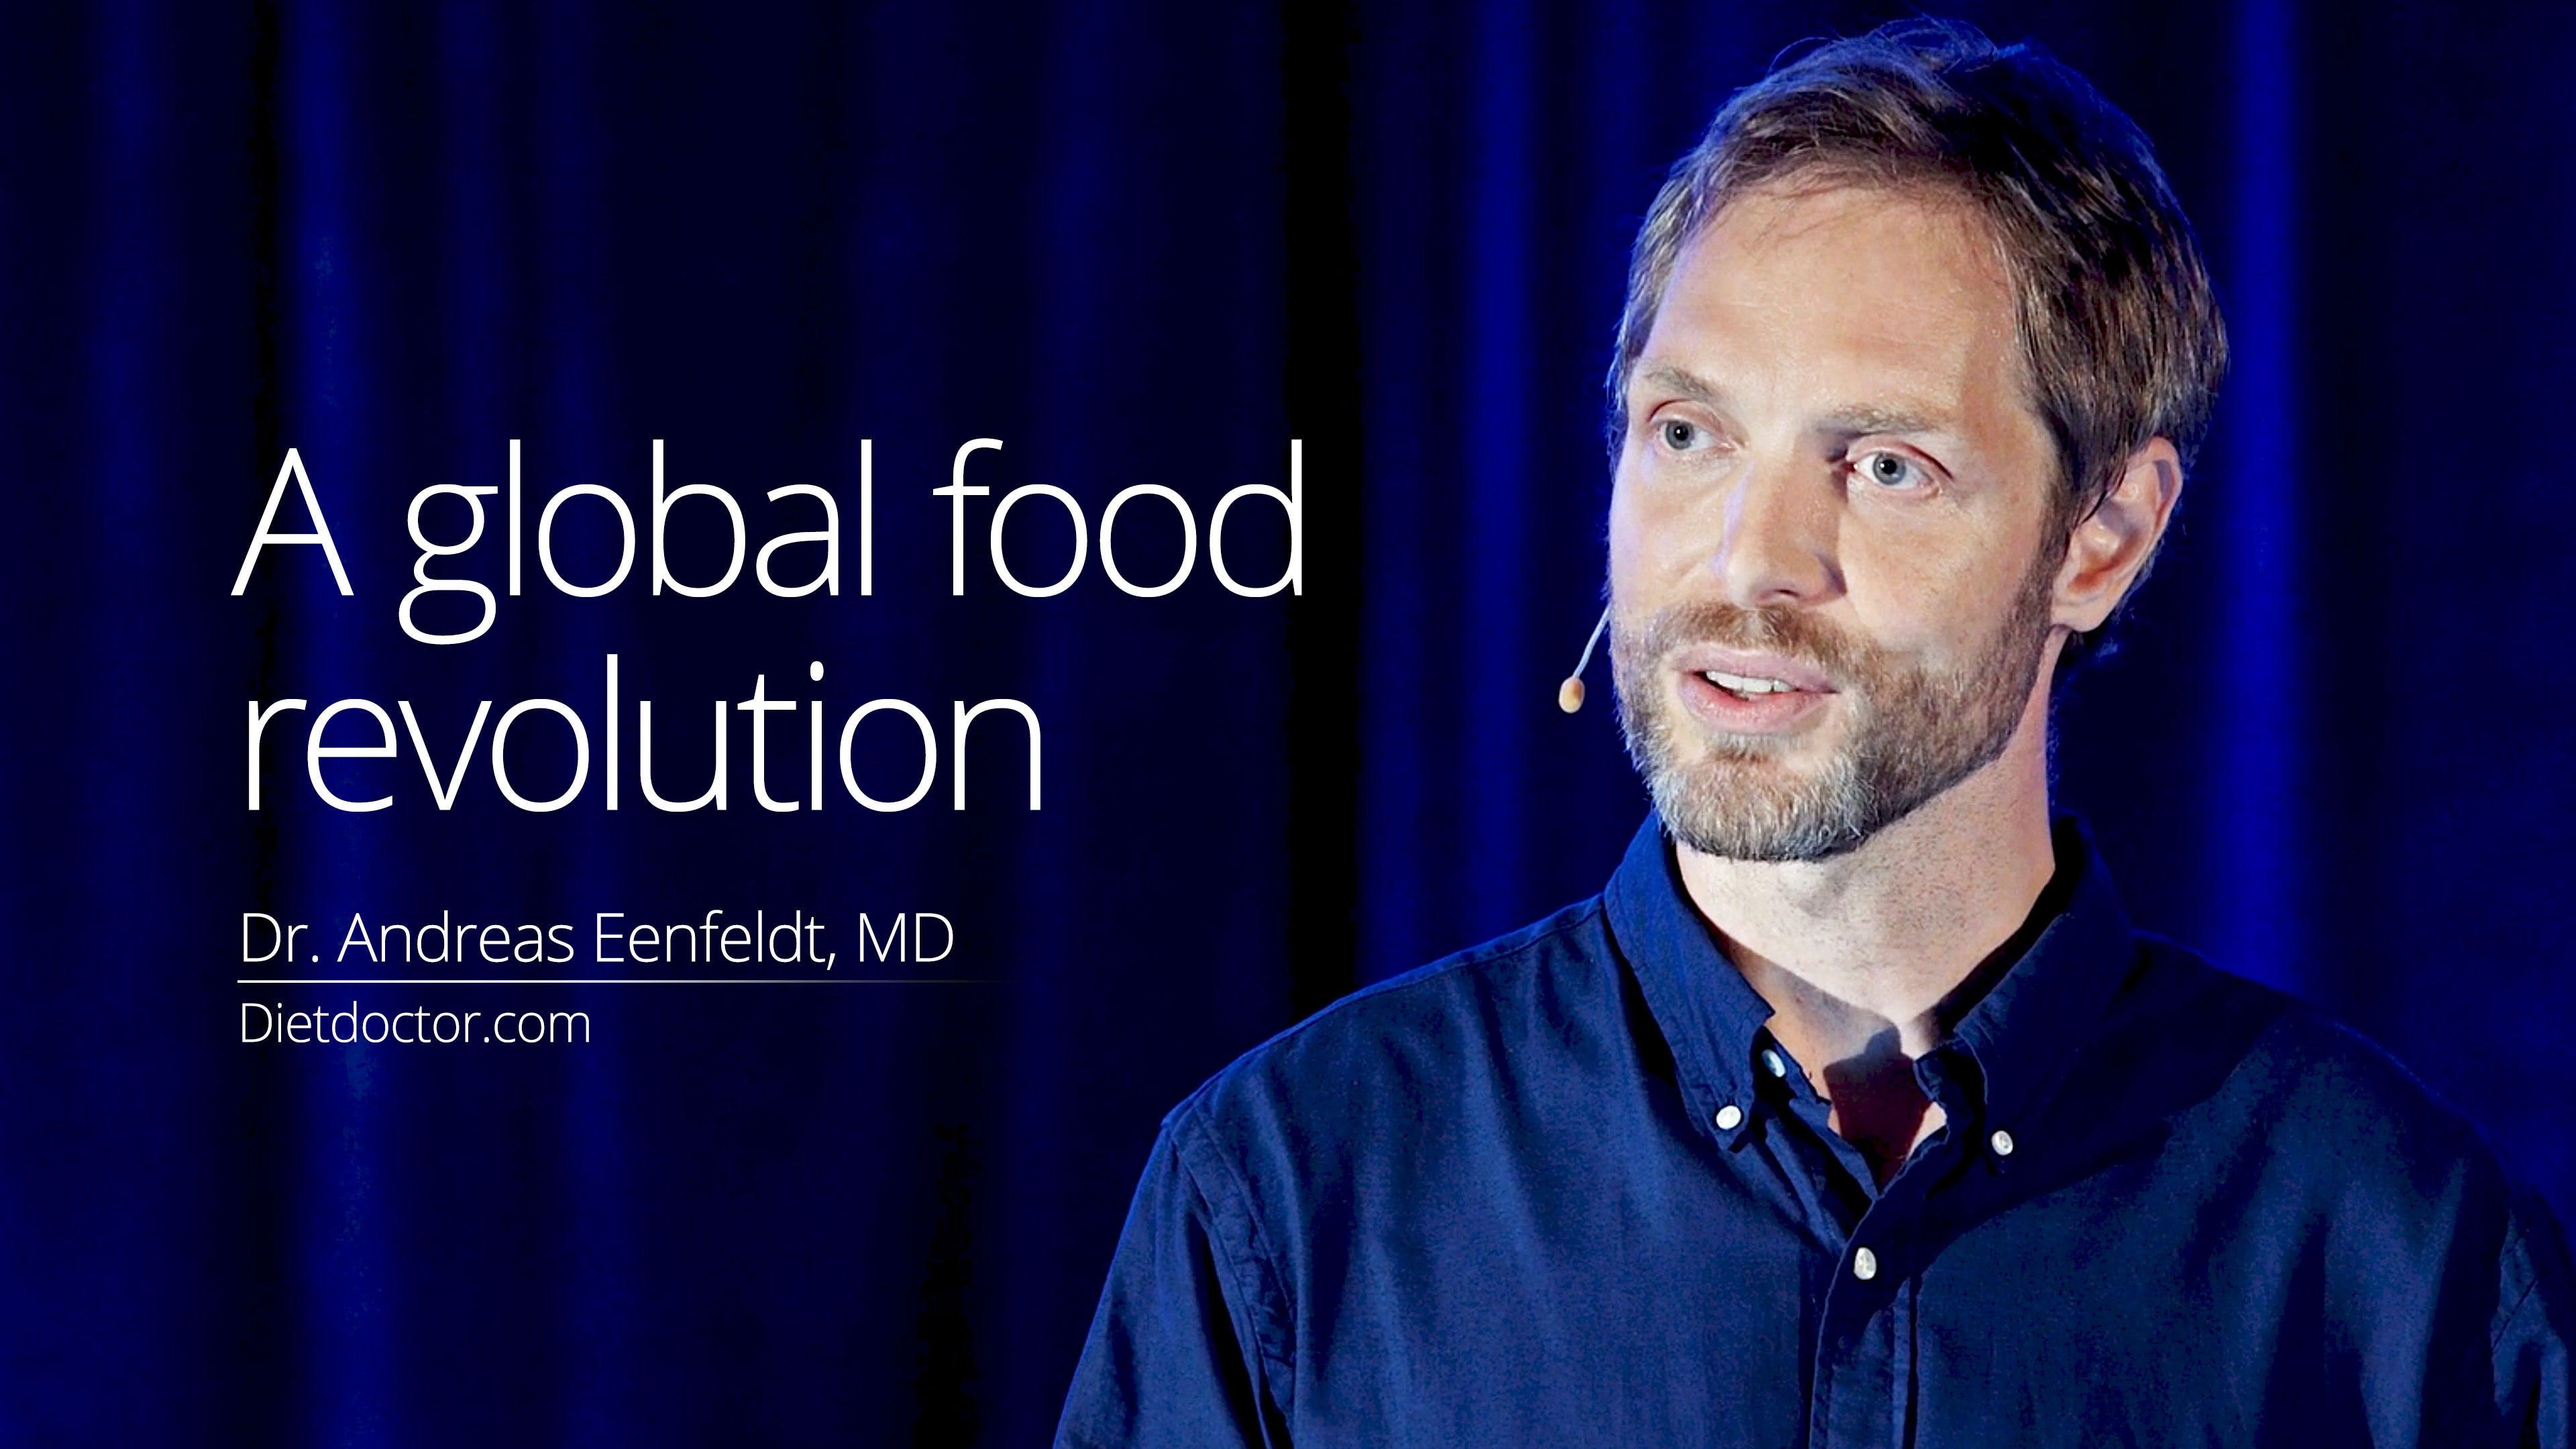 A global food revolution